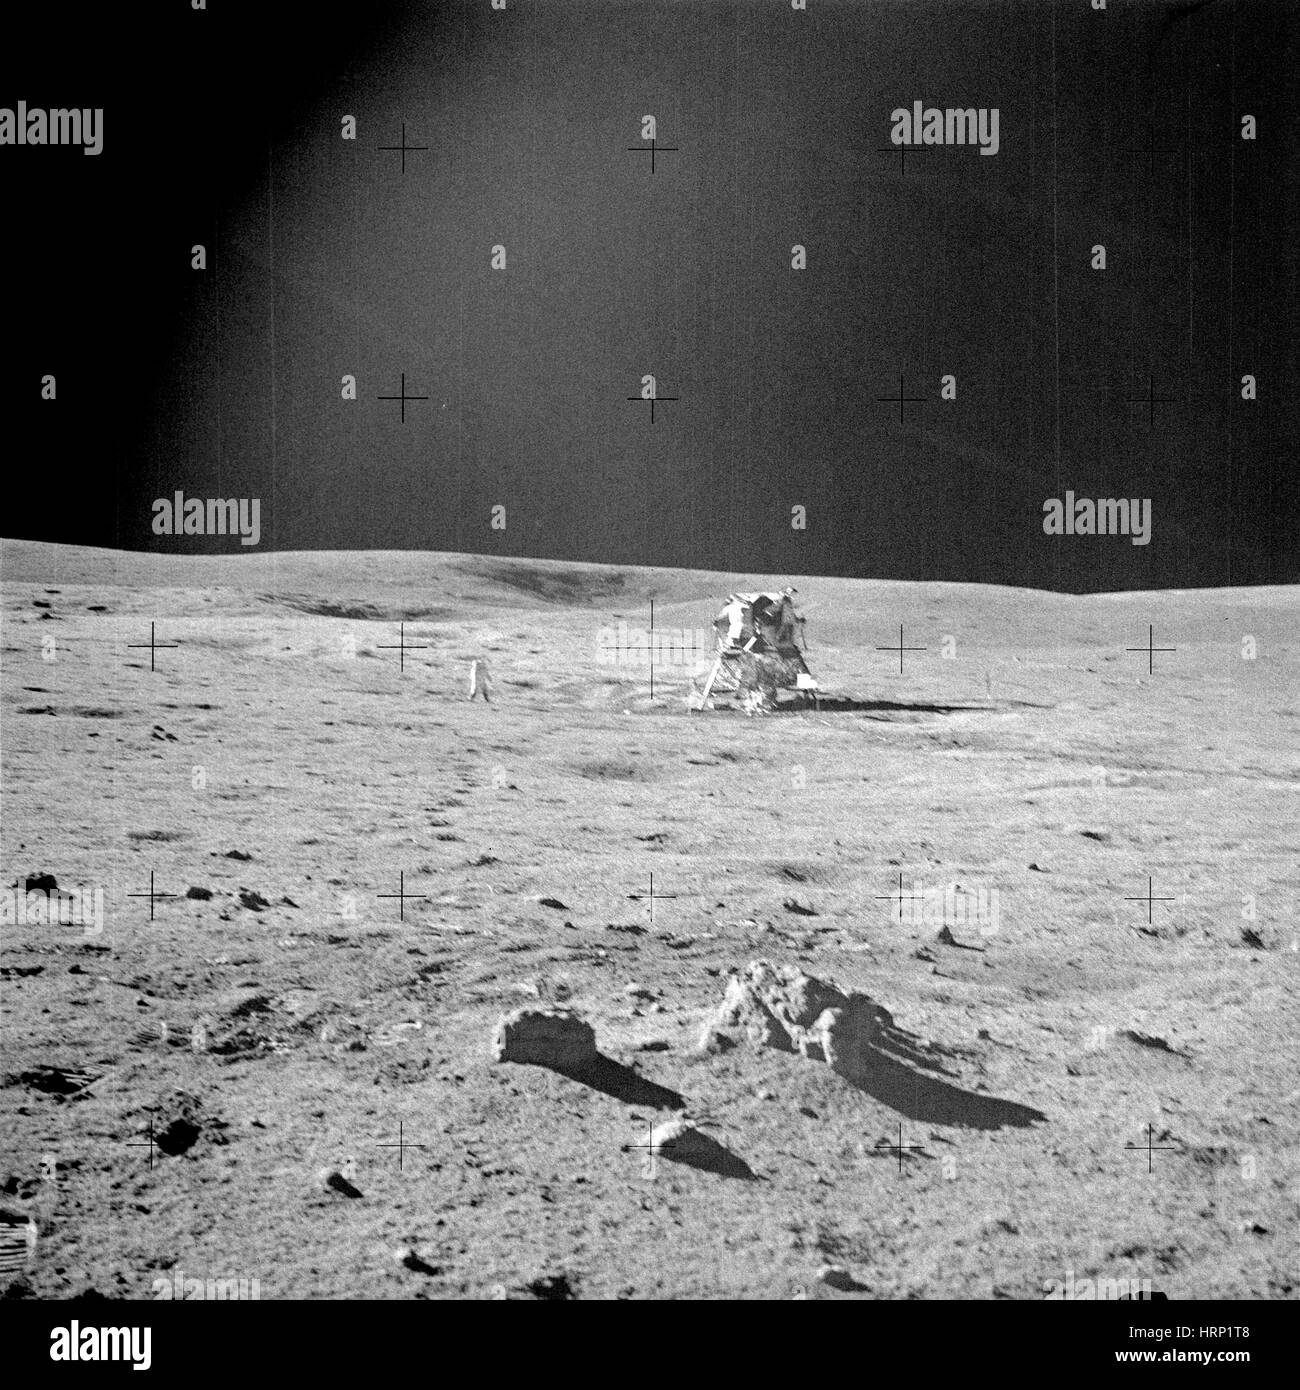 Alan Shepard And Apollo 14 Lunar Module - Stock Image